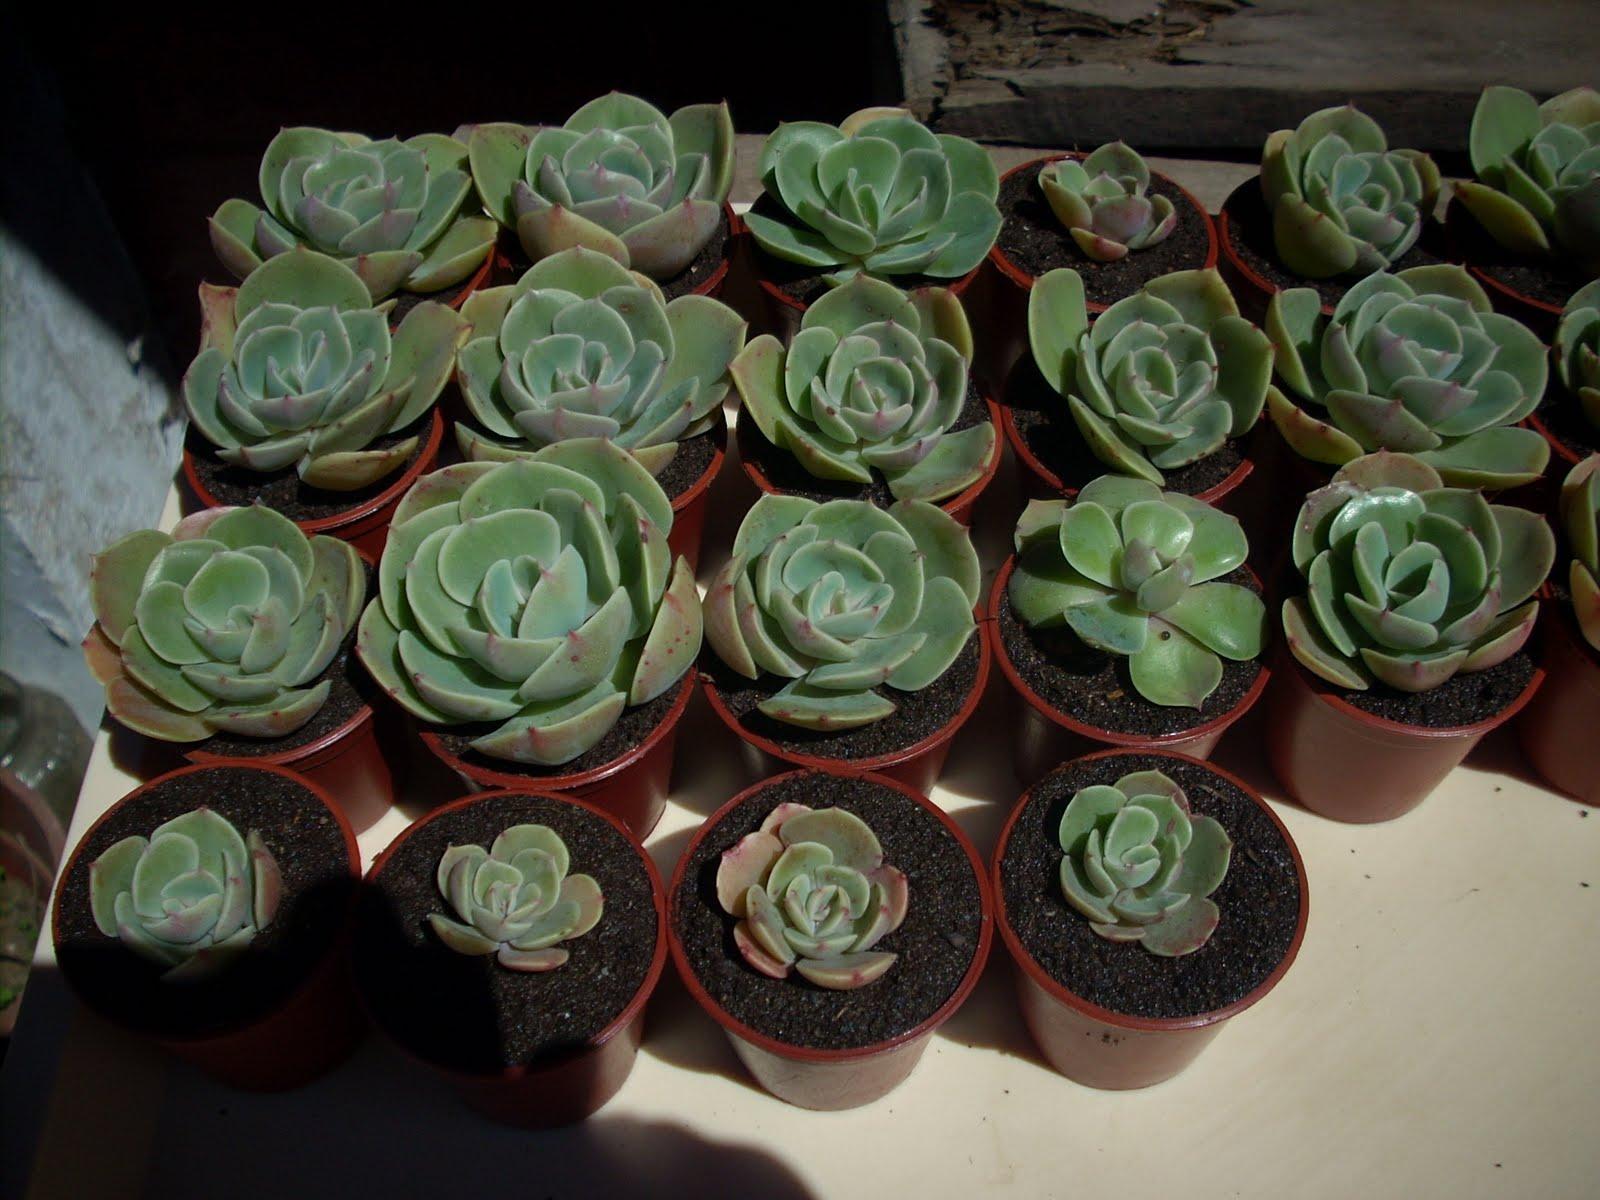 Vivero sanssouci pedido de plantas para punta arena for Suculentas chile